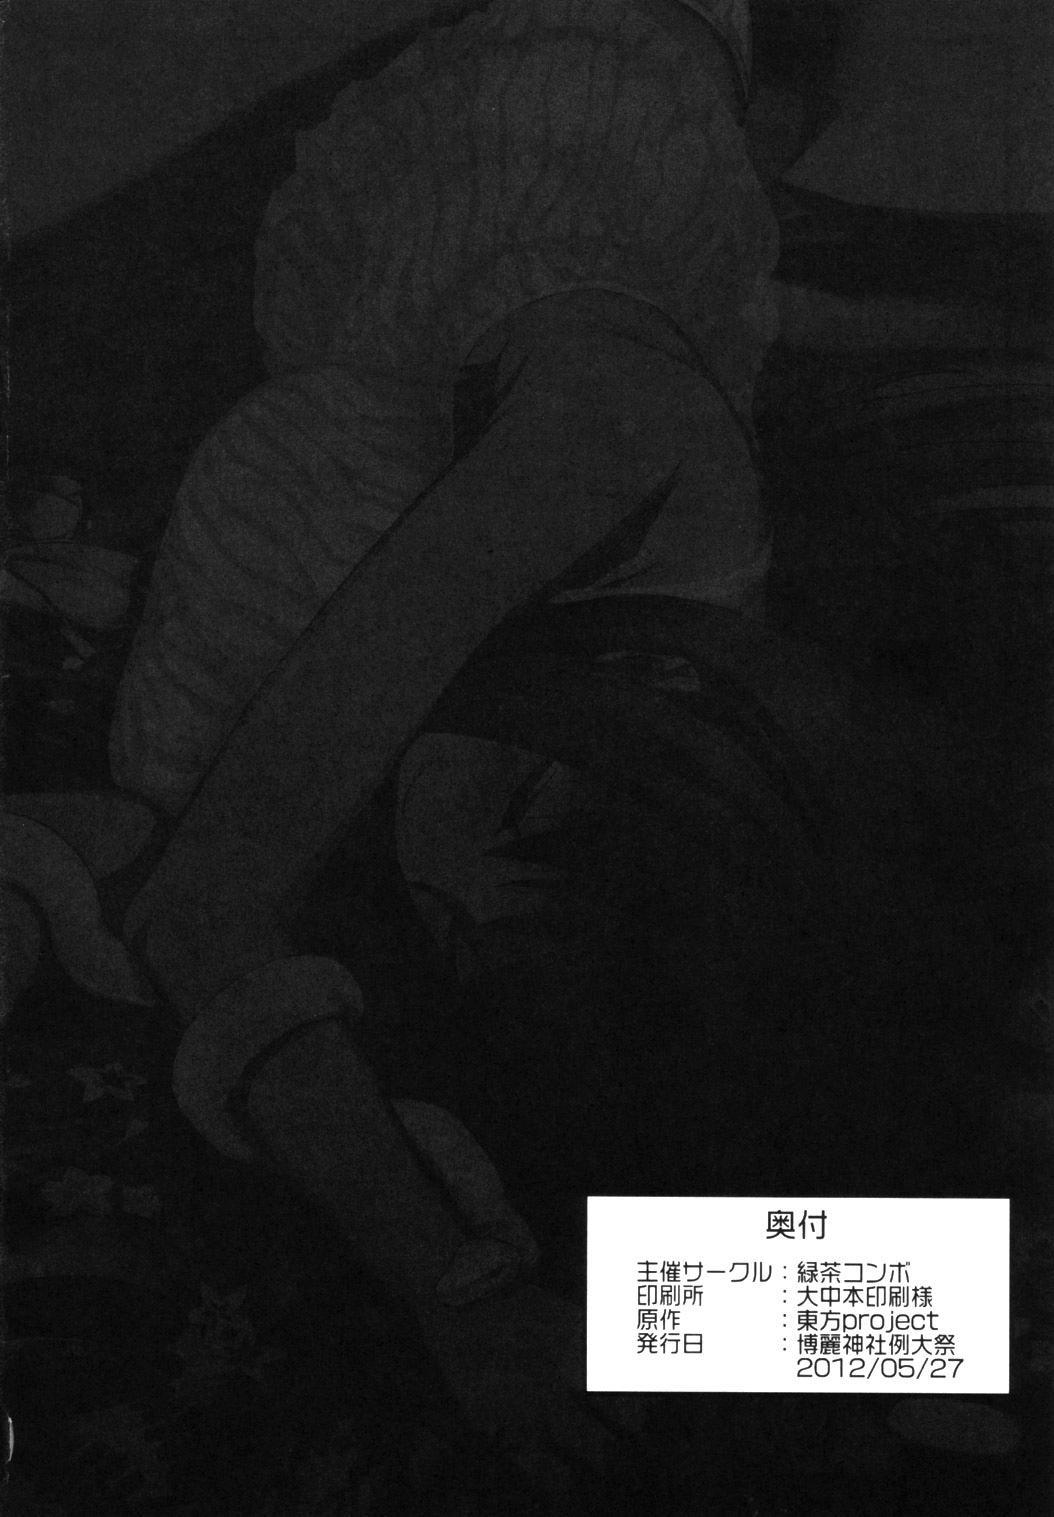 (Reitaisai 9) [various] Touhou Sleep Sex Anthology ch1-3, 6-8, 10, 14, 16, 19, 21 (Touhou Project) [English] {pesu} 96